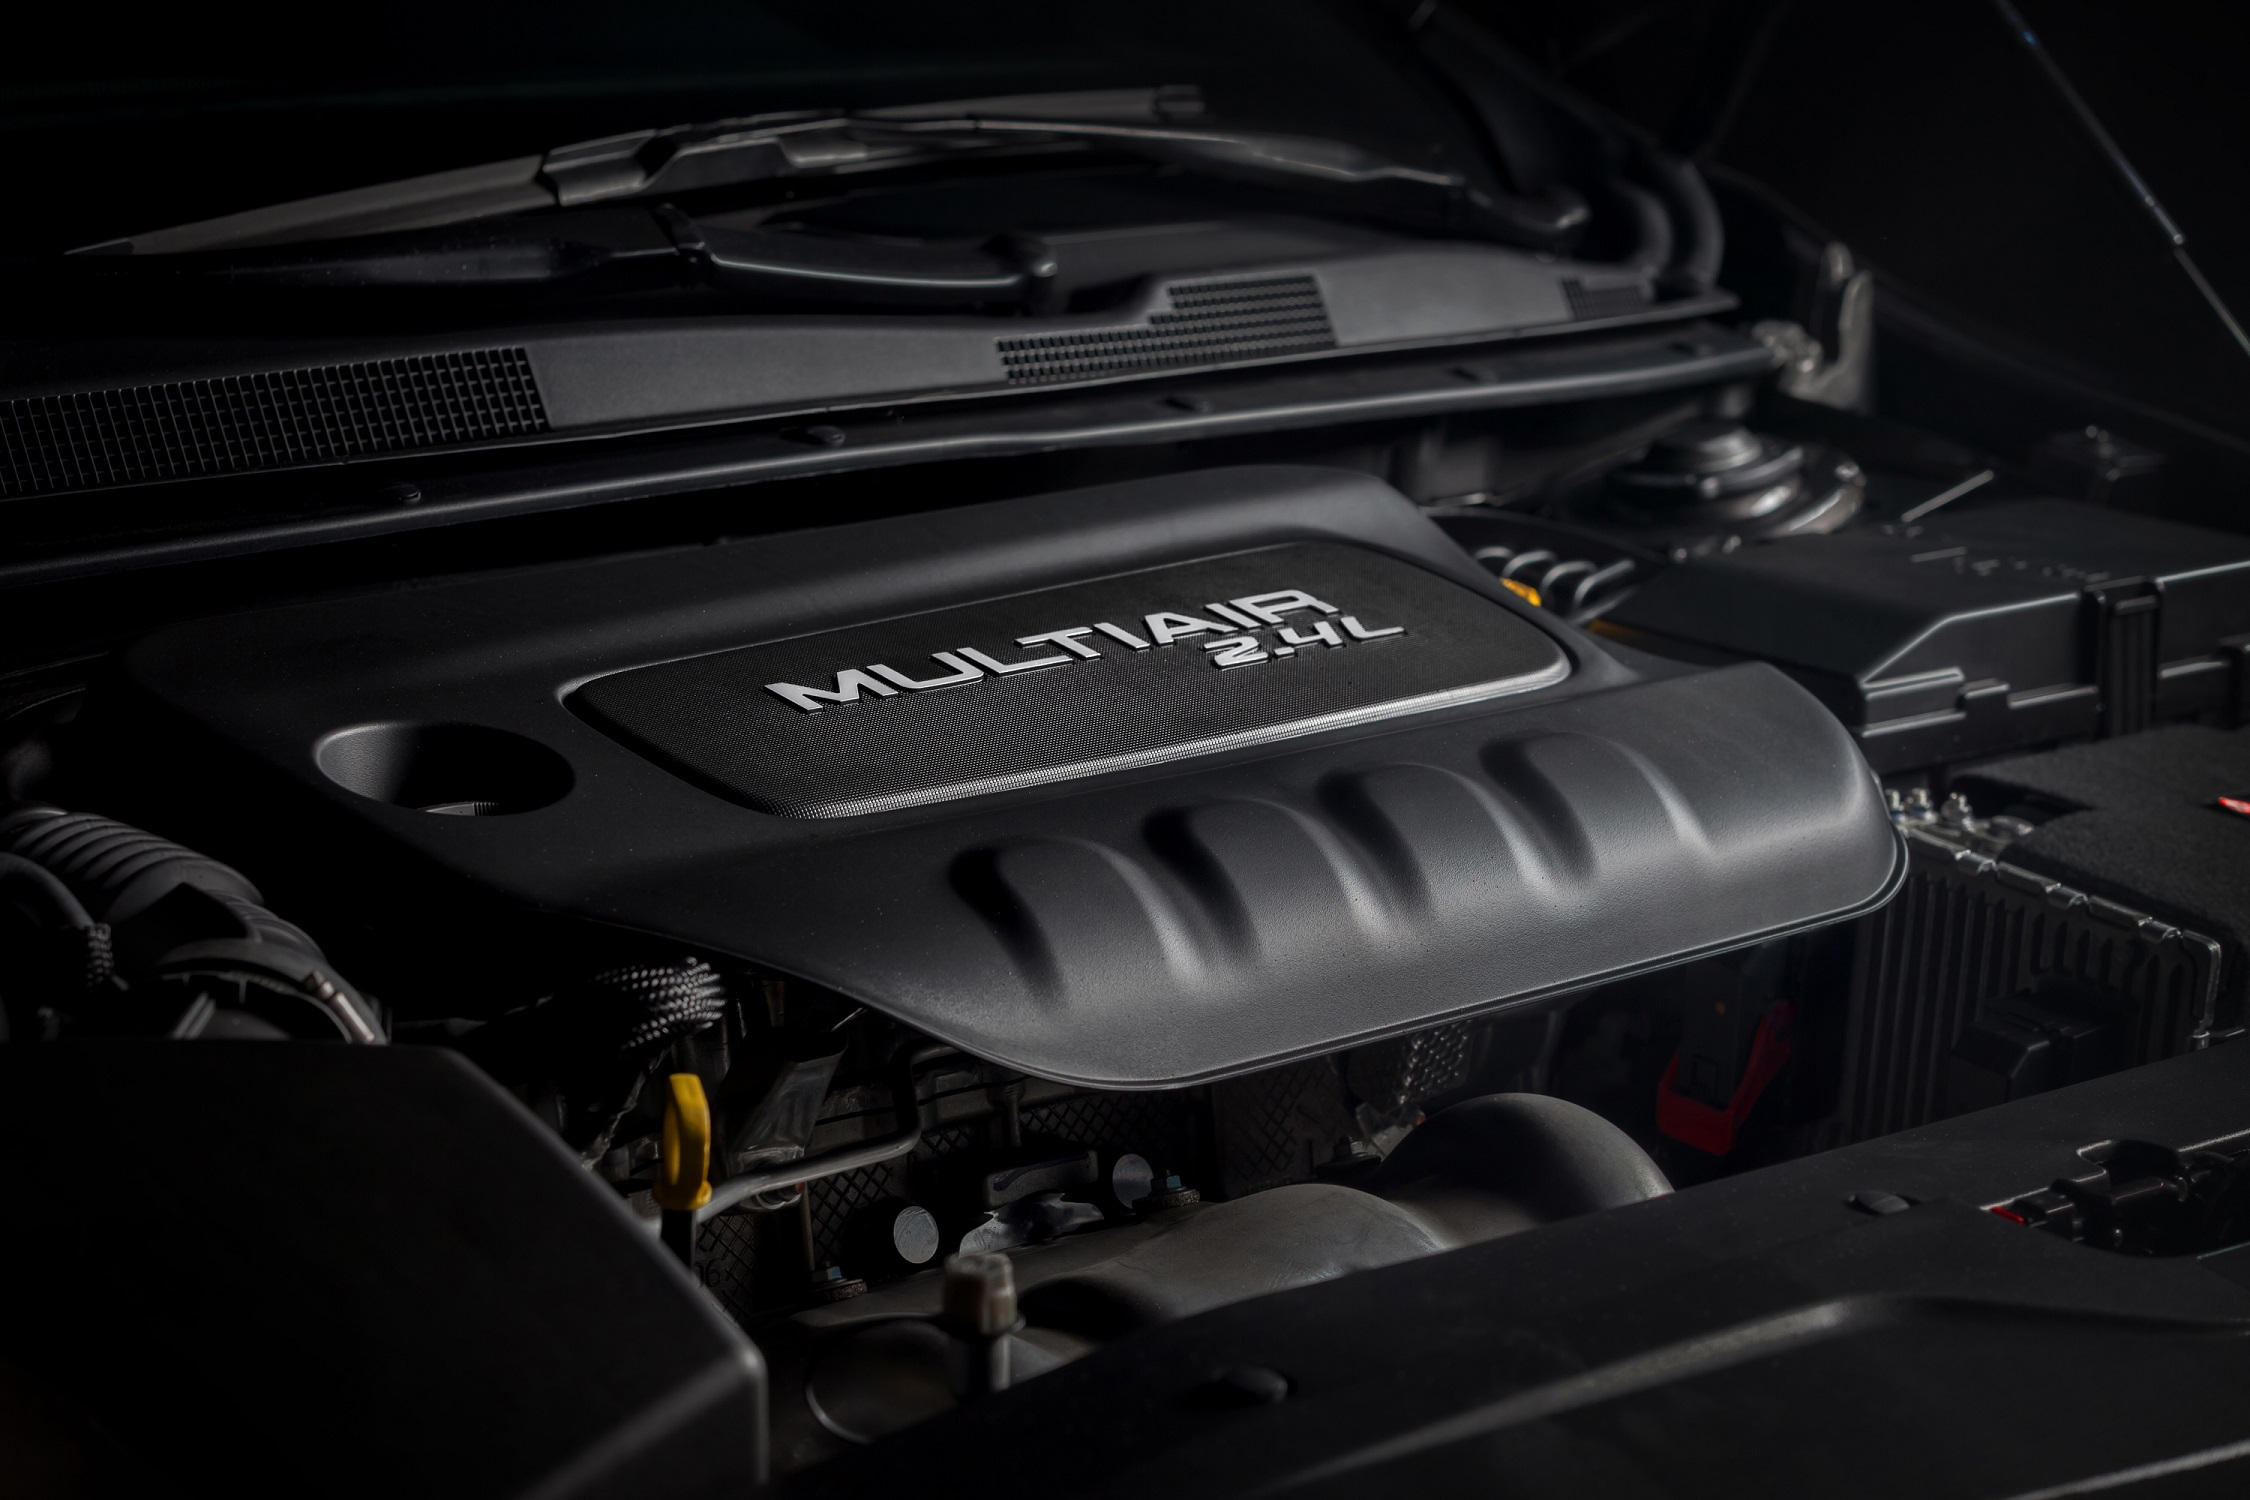 2015 Chrysler 200 2.4-liter MultiAir2 Tigershark I-4 engine